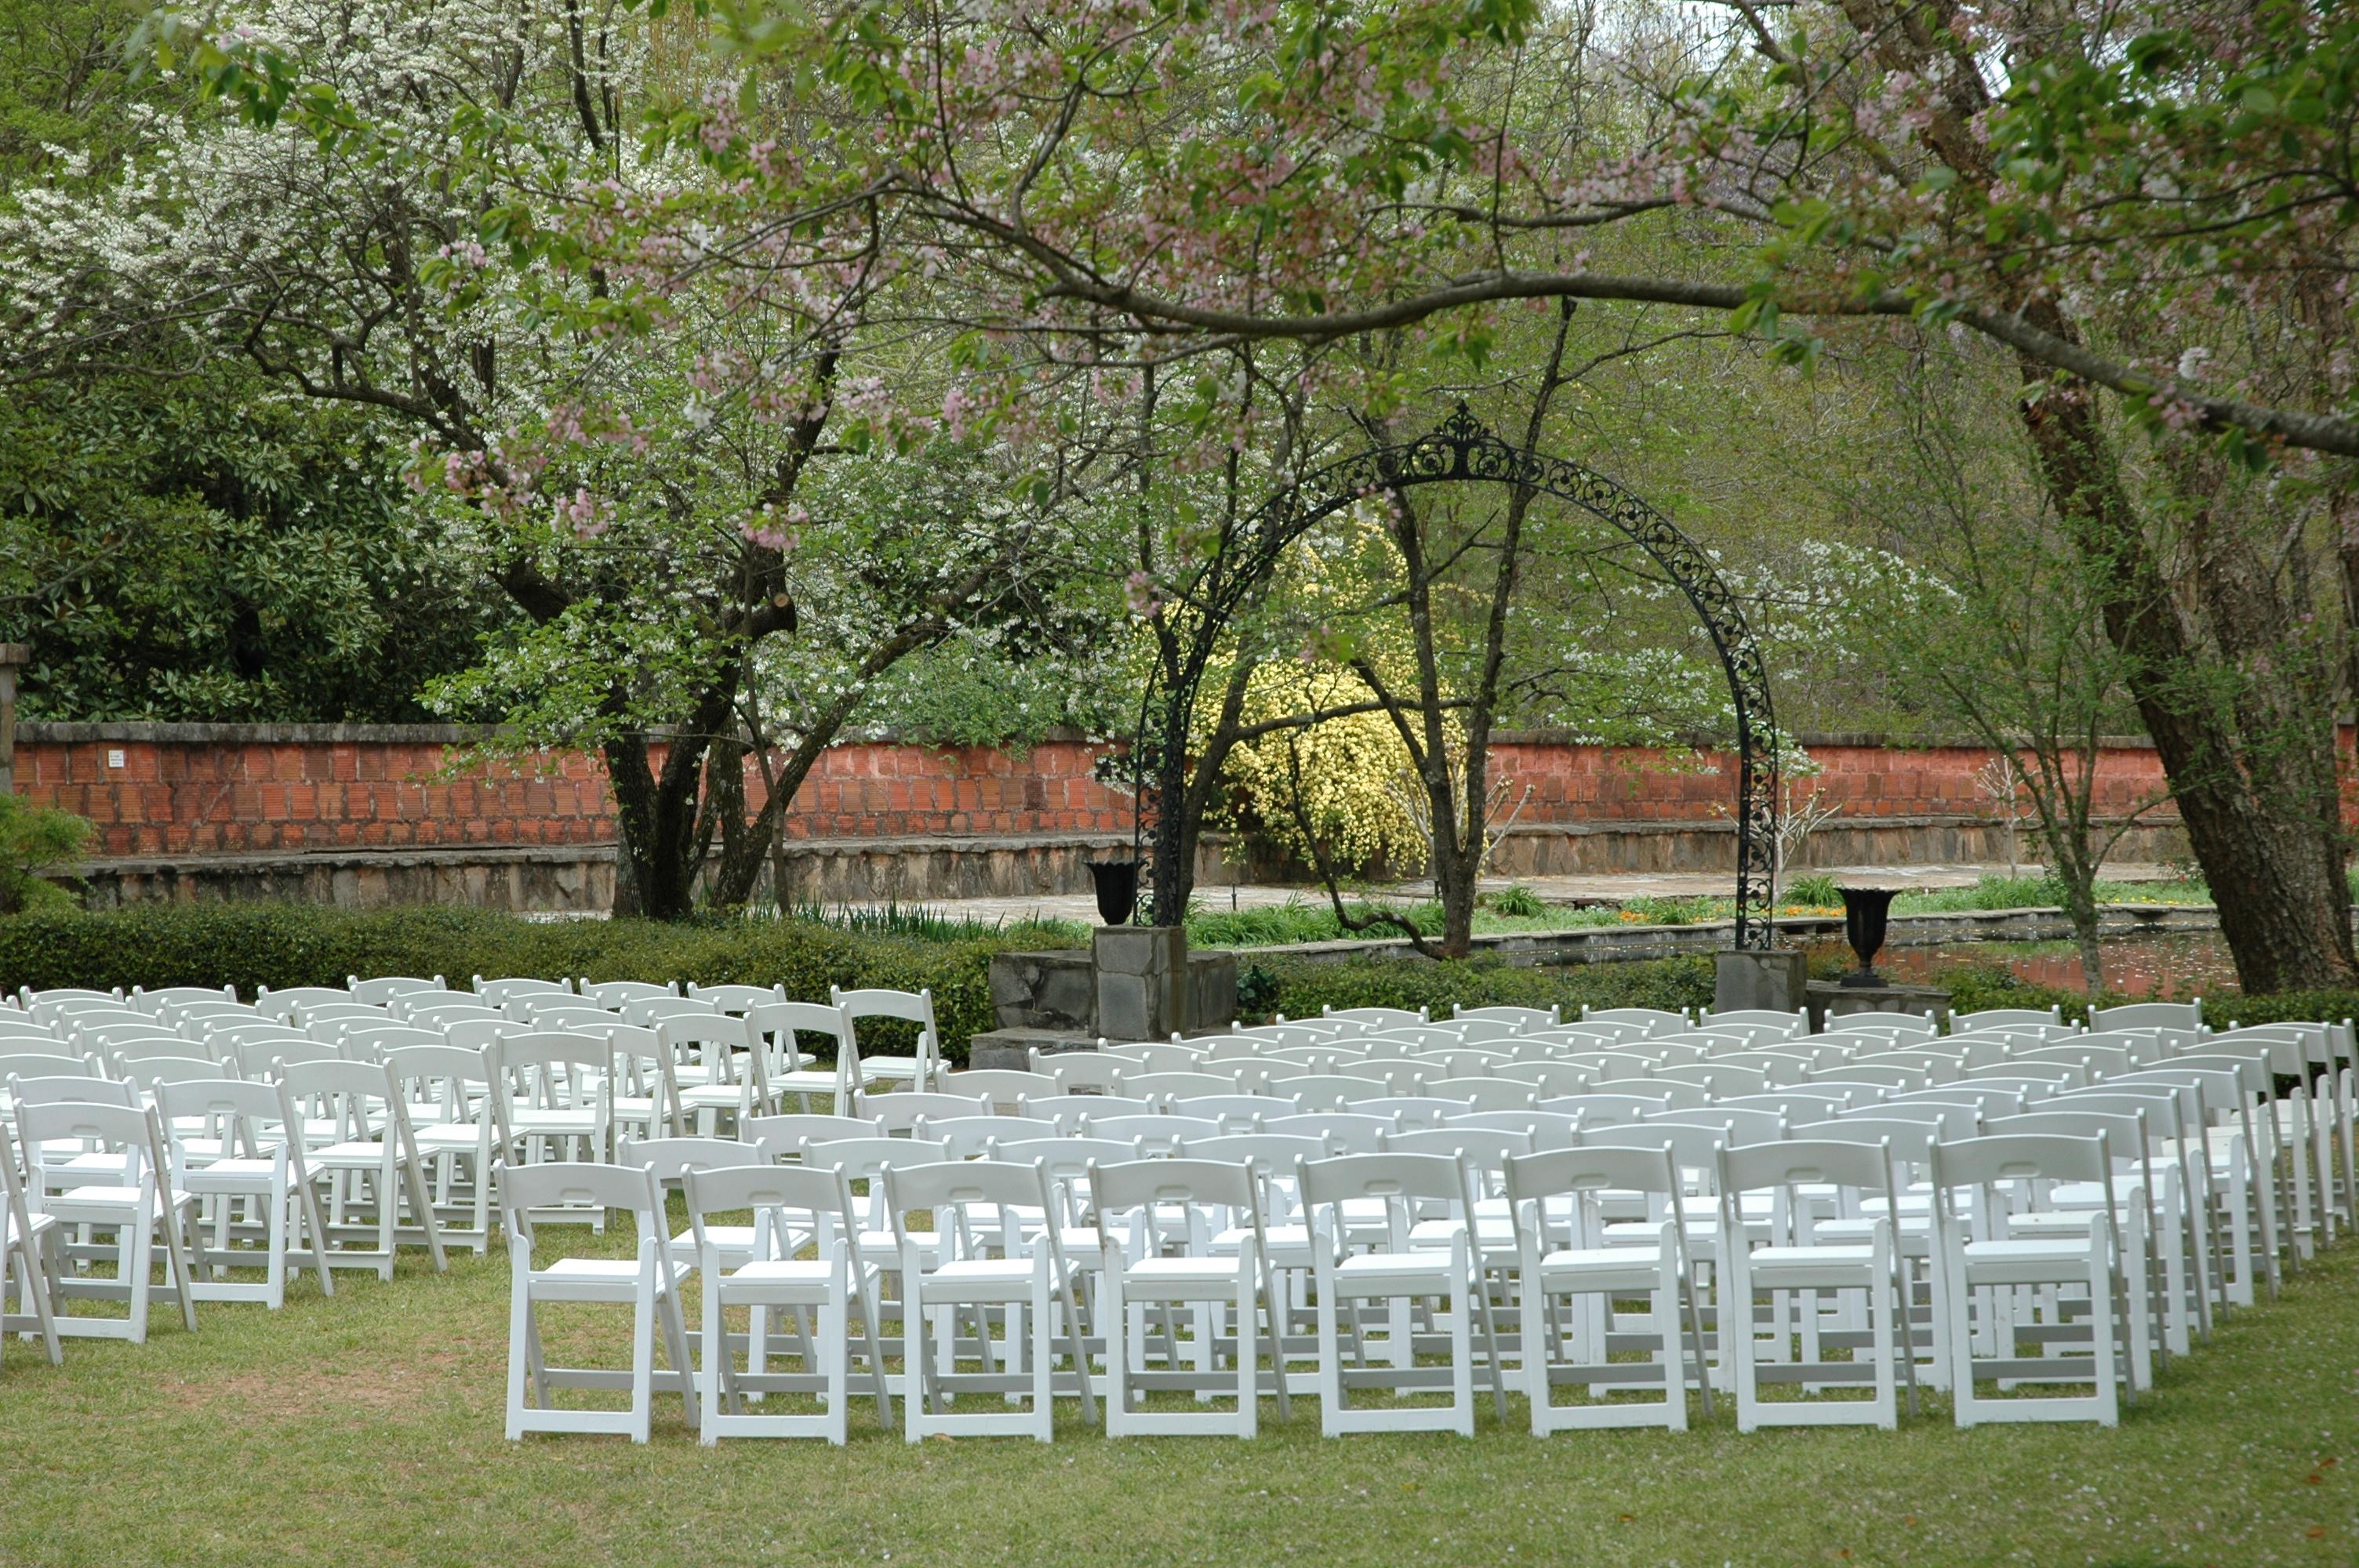 https://alabama-travel.s3.amazonaws.com/partners-uploads/photo/image/59497c8d7373907f2300003f/wedding_garden_11.jpg